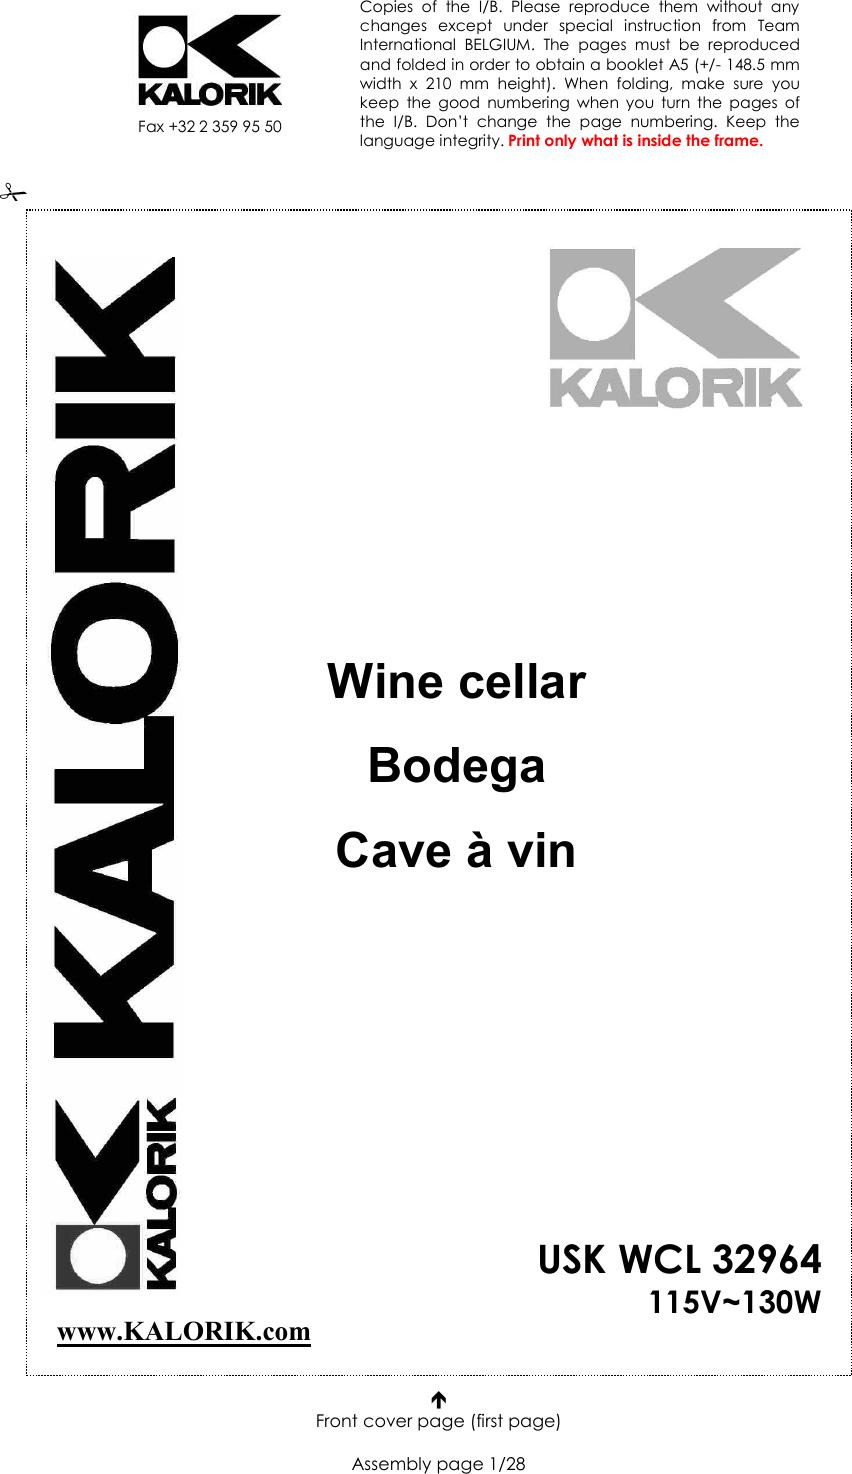 Kalorik Wine Cellar Usk Wcl 32964 115V130W Users Manual ... on